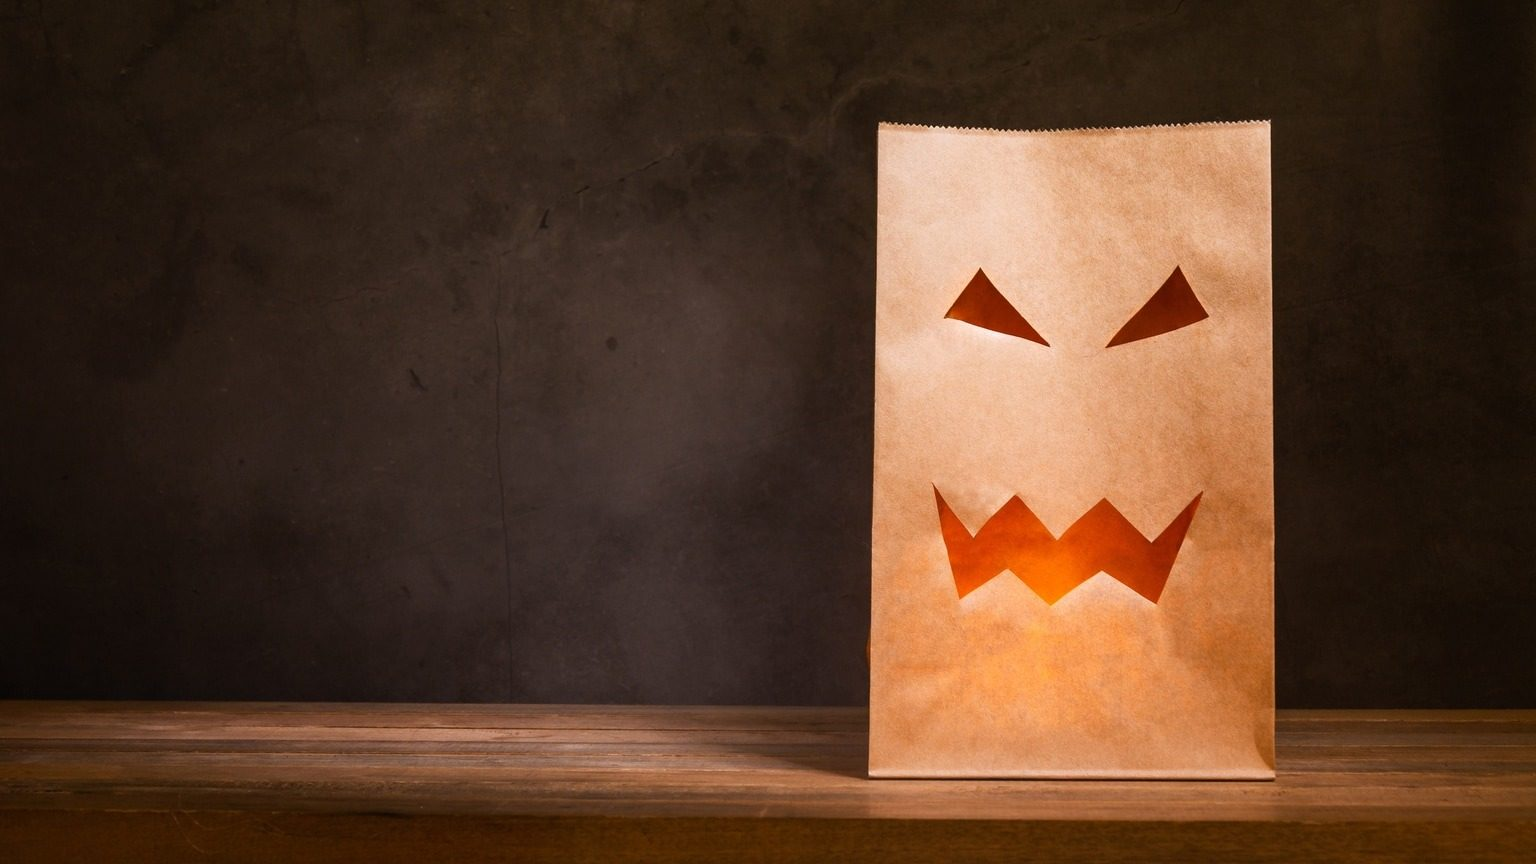 Brown paper jack-o'-lantern Halloween decoration